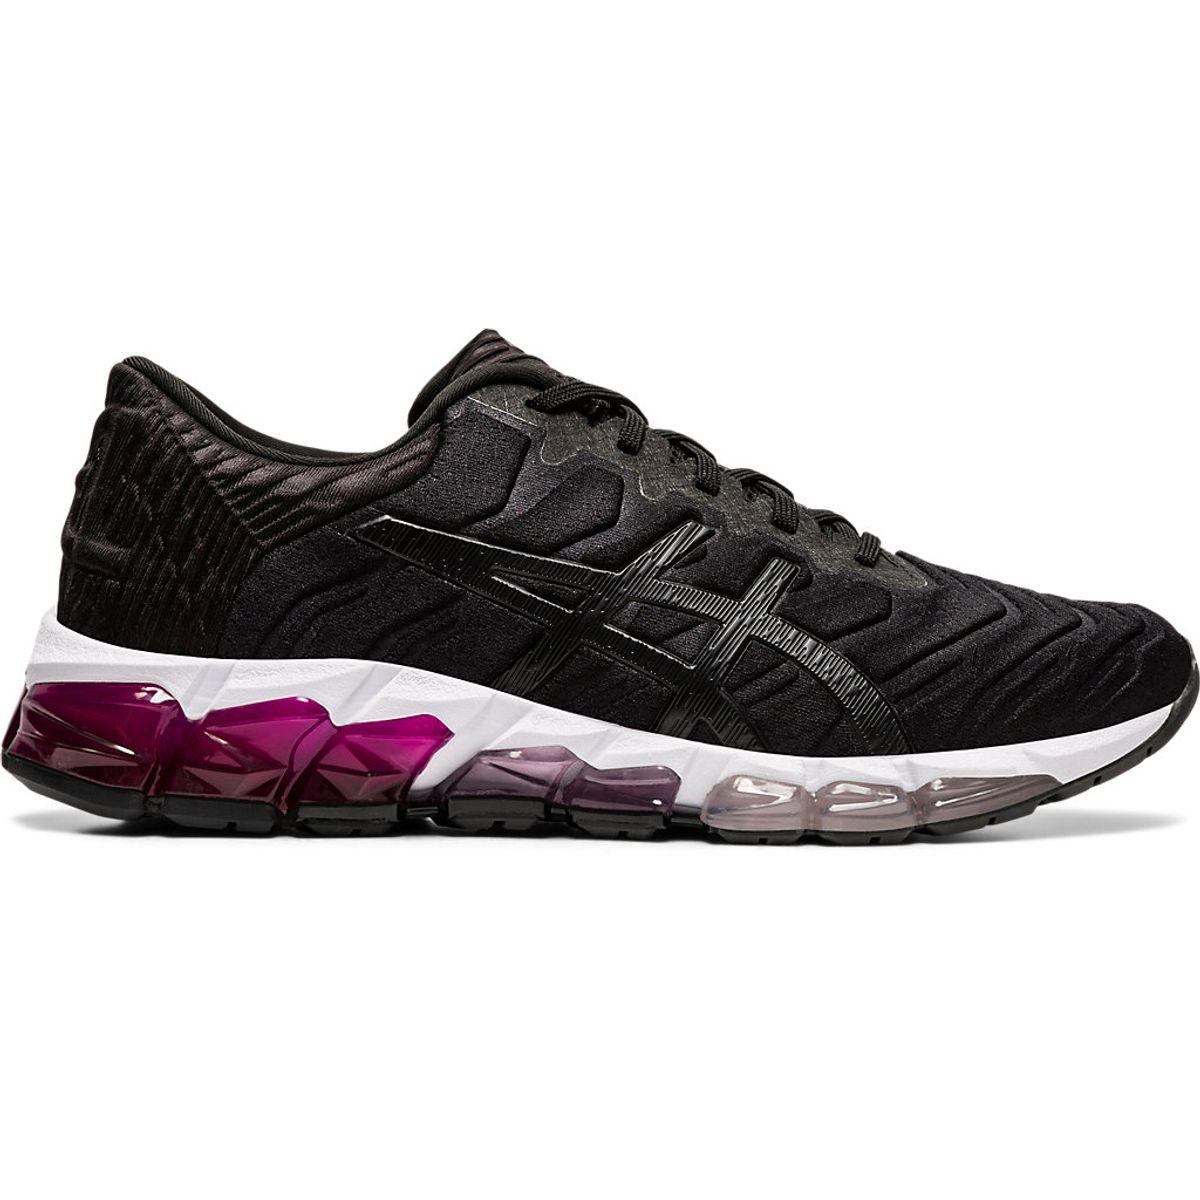 Tenis-Asics-GEL-Quantum-360-5----Feminino---Preto-com-Branco-e-Rosa